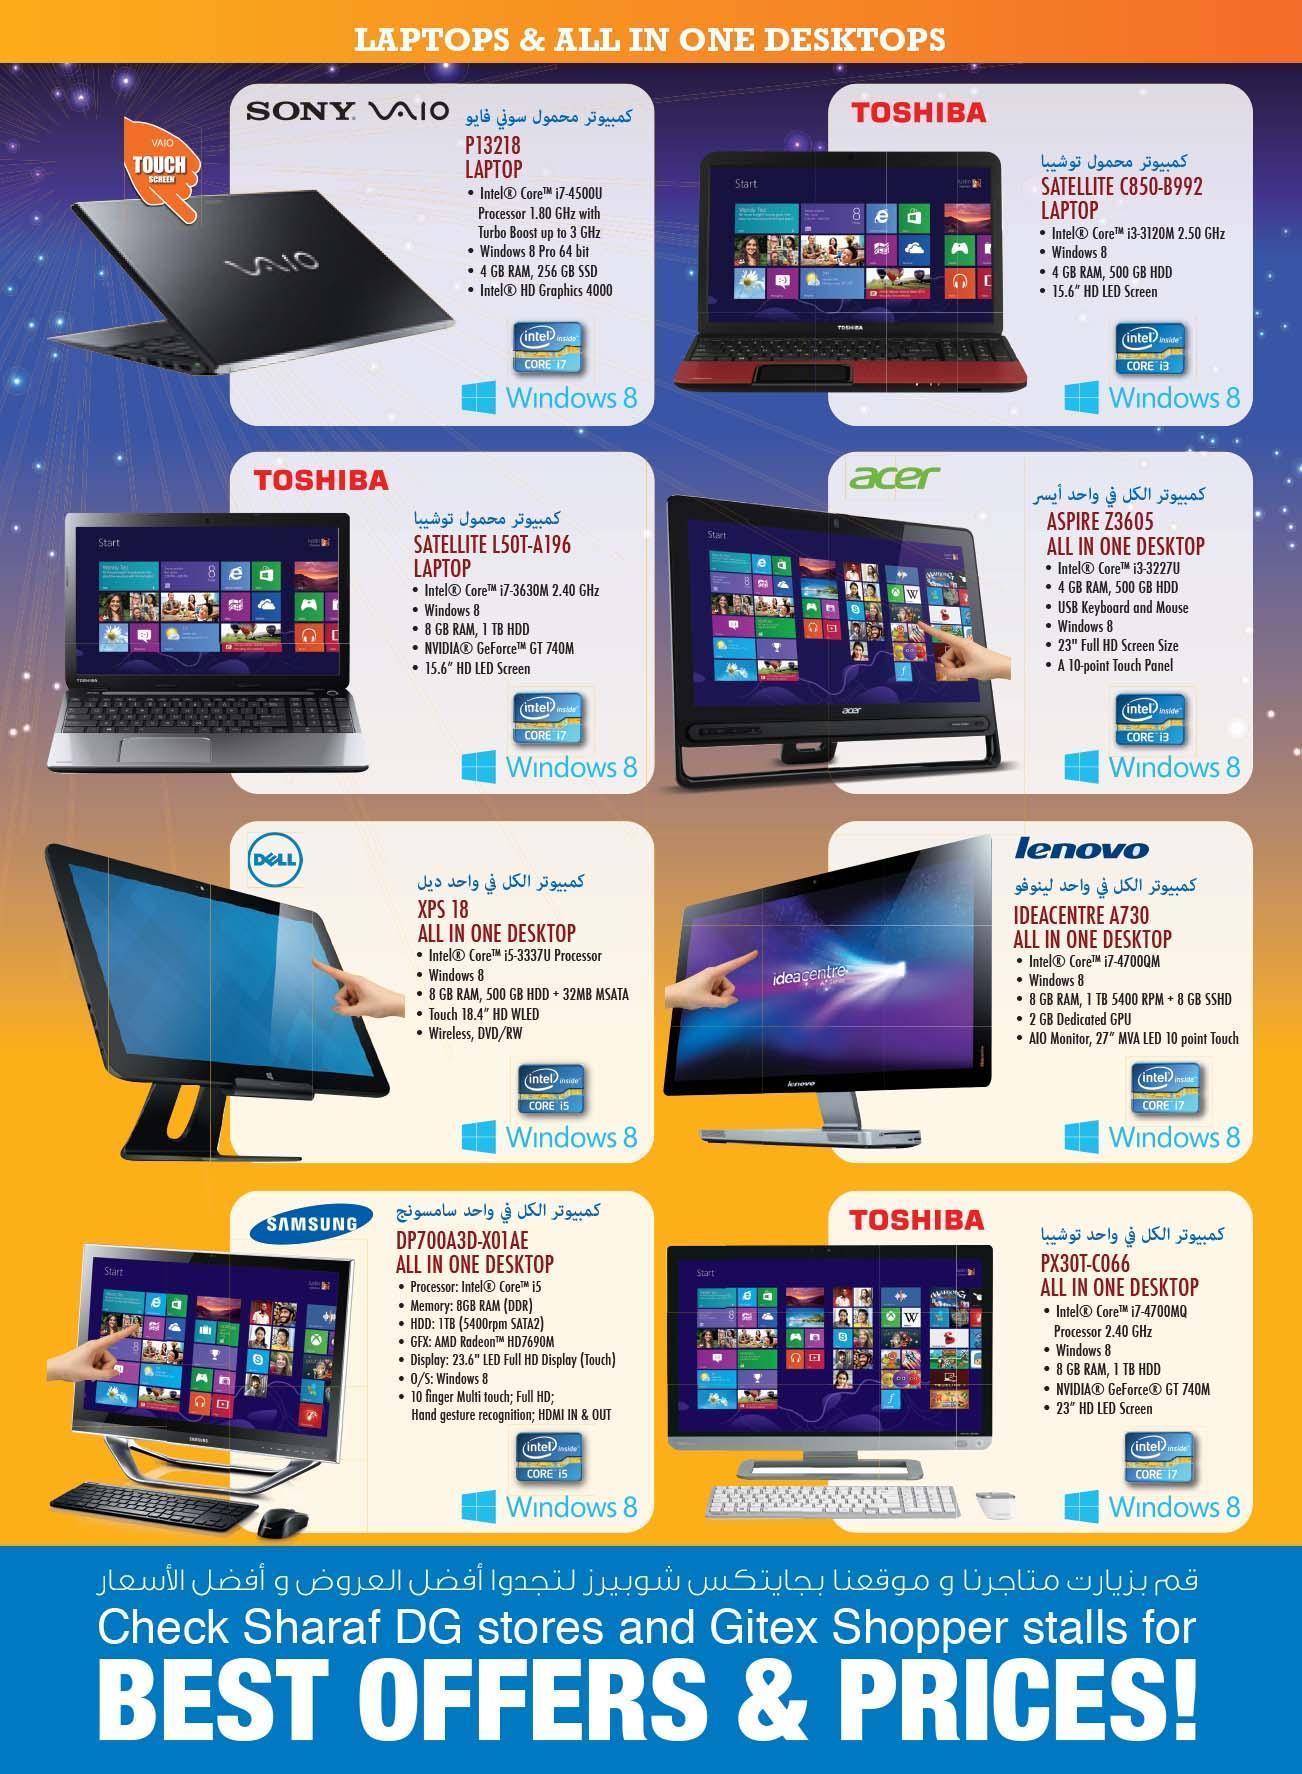 Biggest Gitex Offers on Laptops & All in One Desktops -